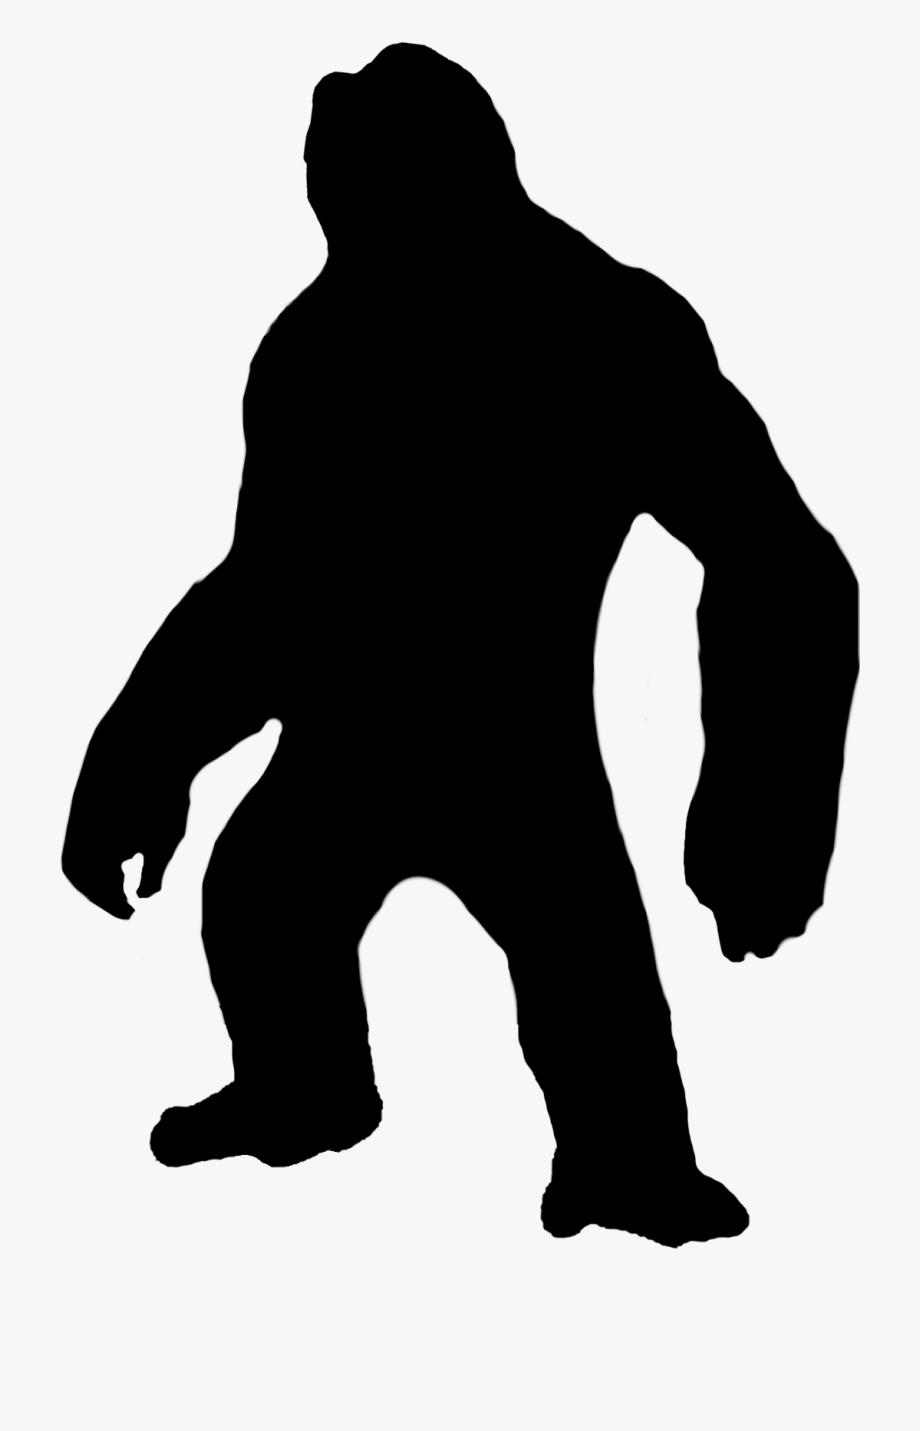 Gorilla At Getdrawings Com Free For Personal.